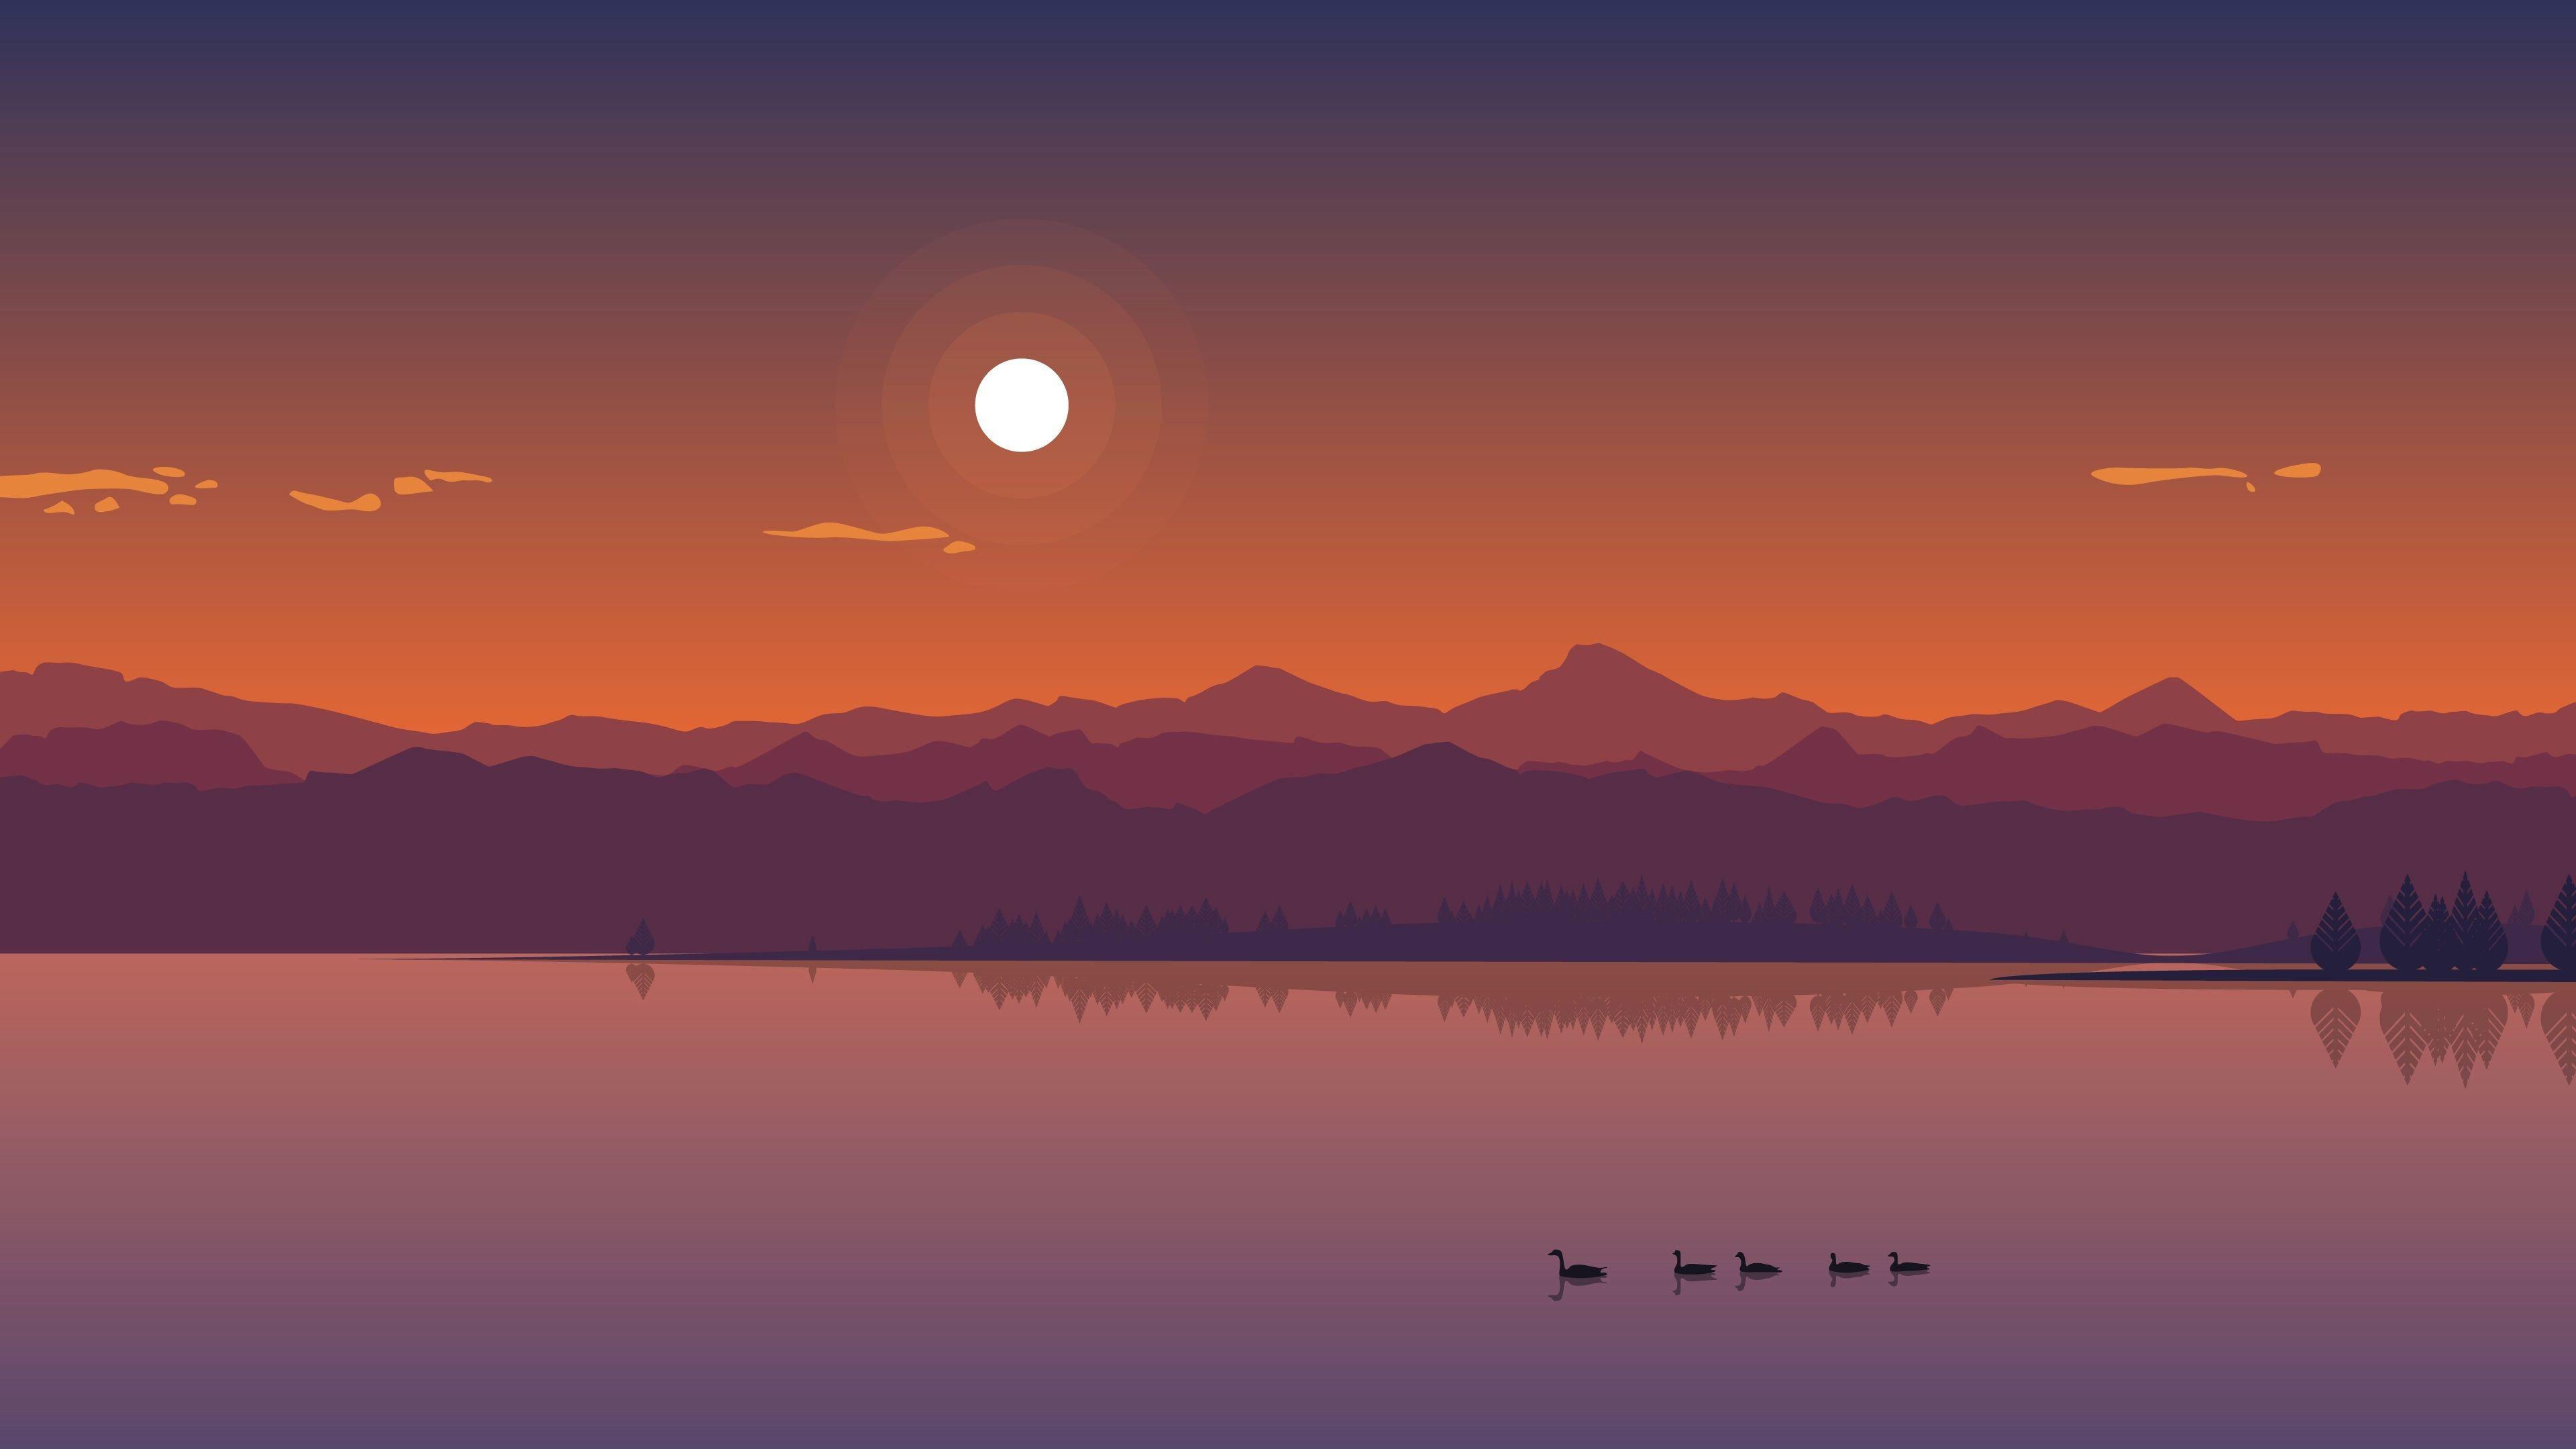 Wallpaper Vector Lake Duck Mountains Clouds Sun Digital